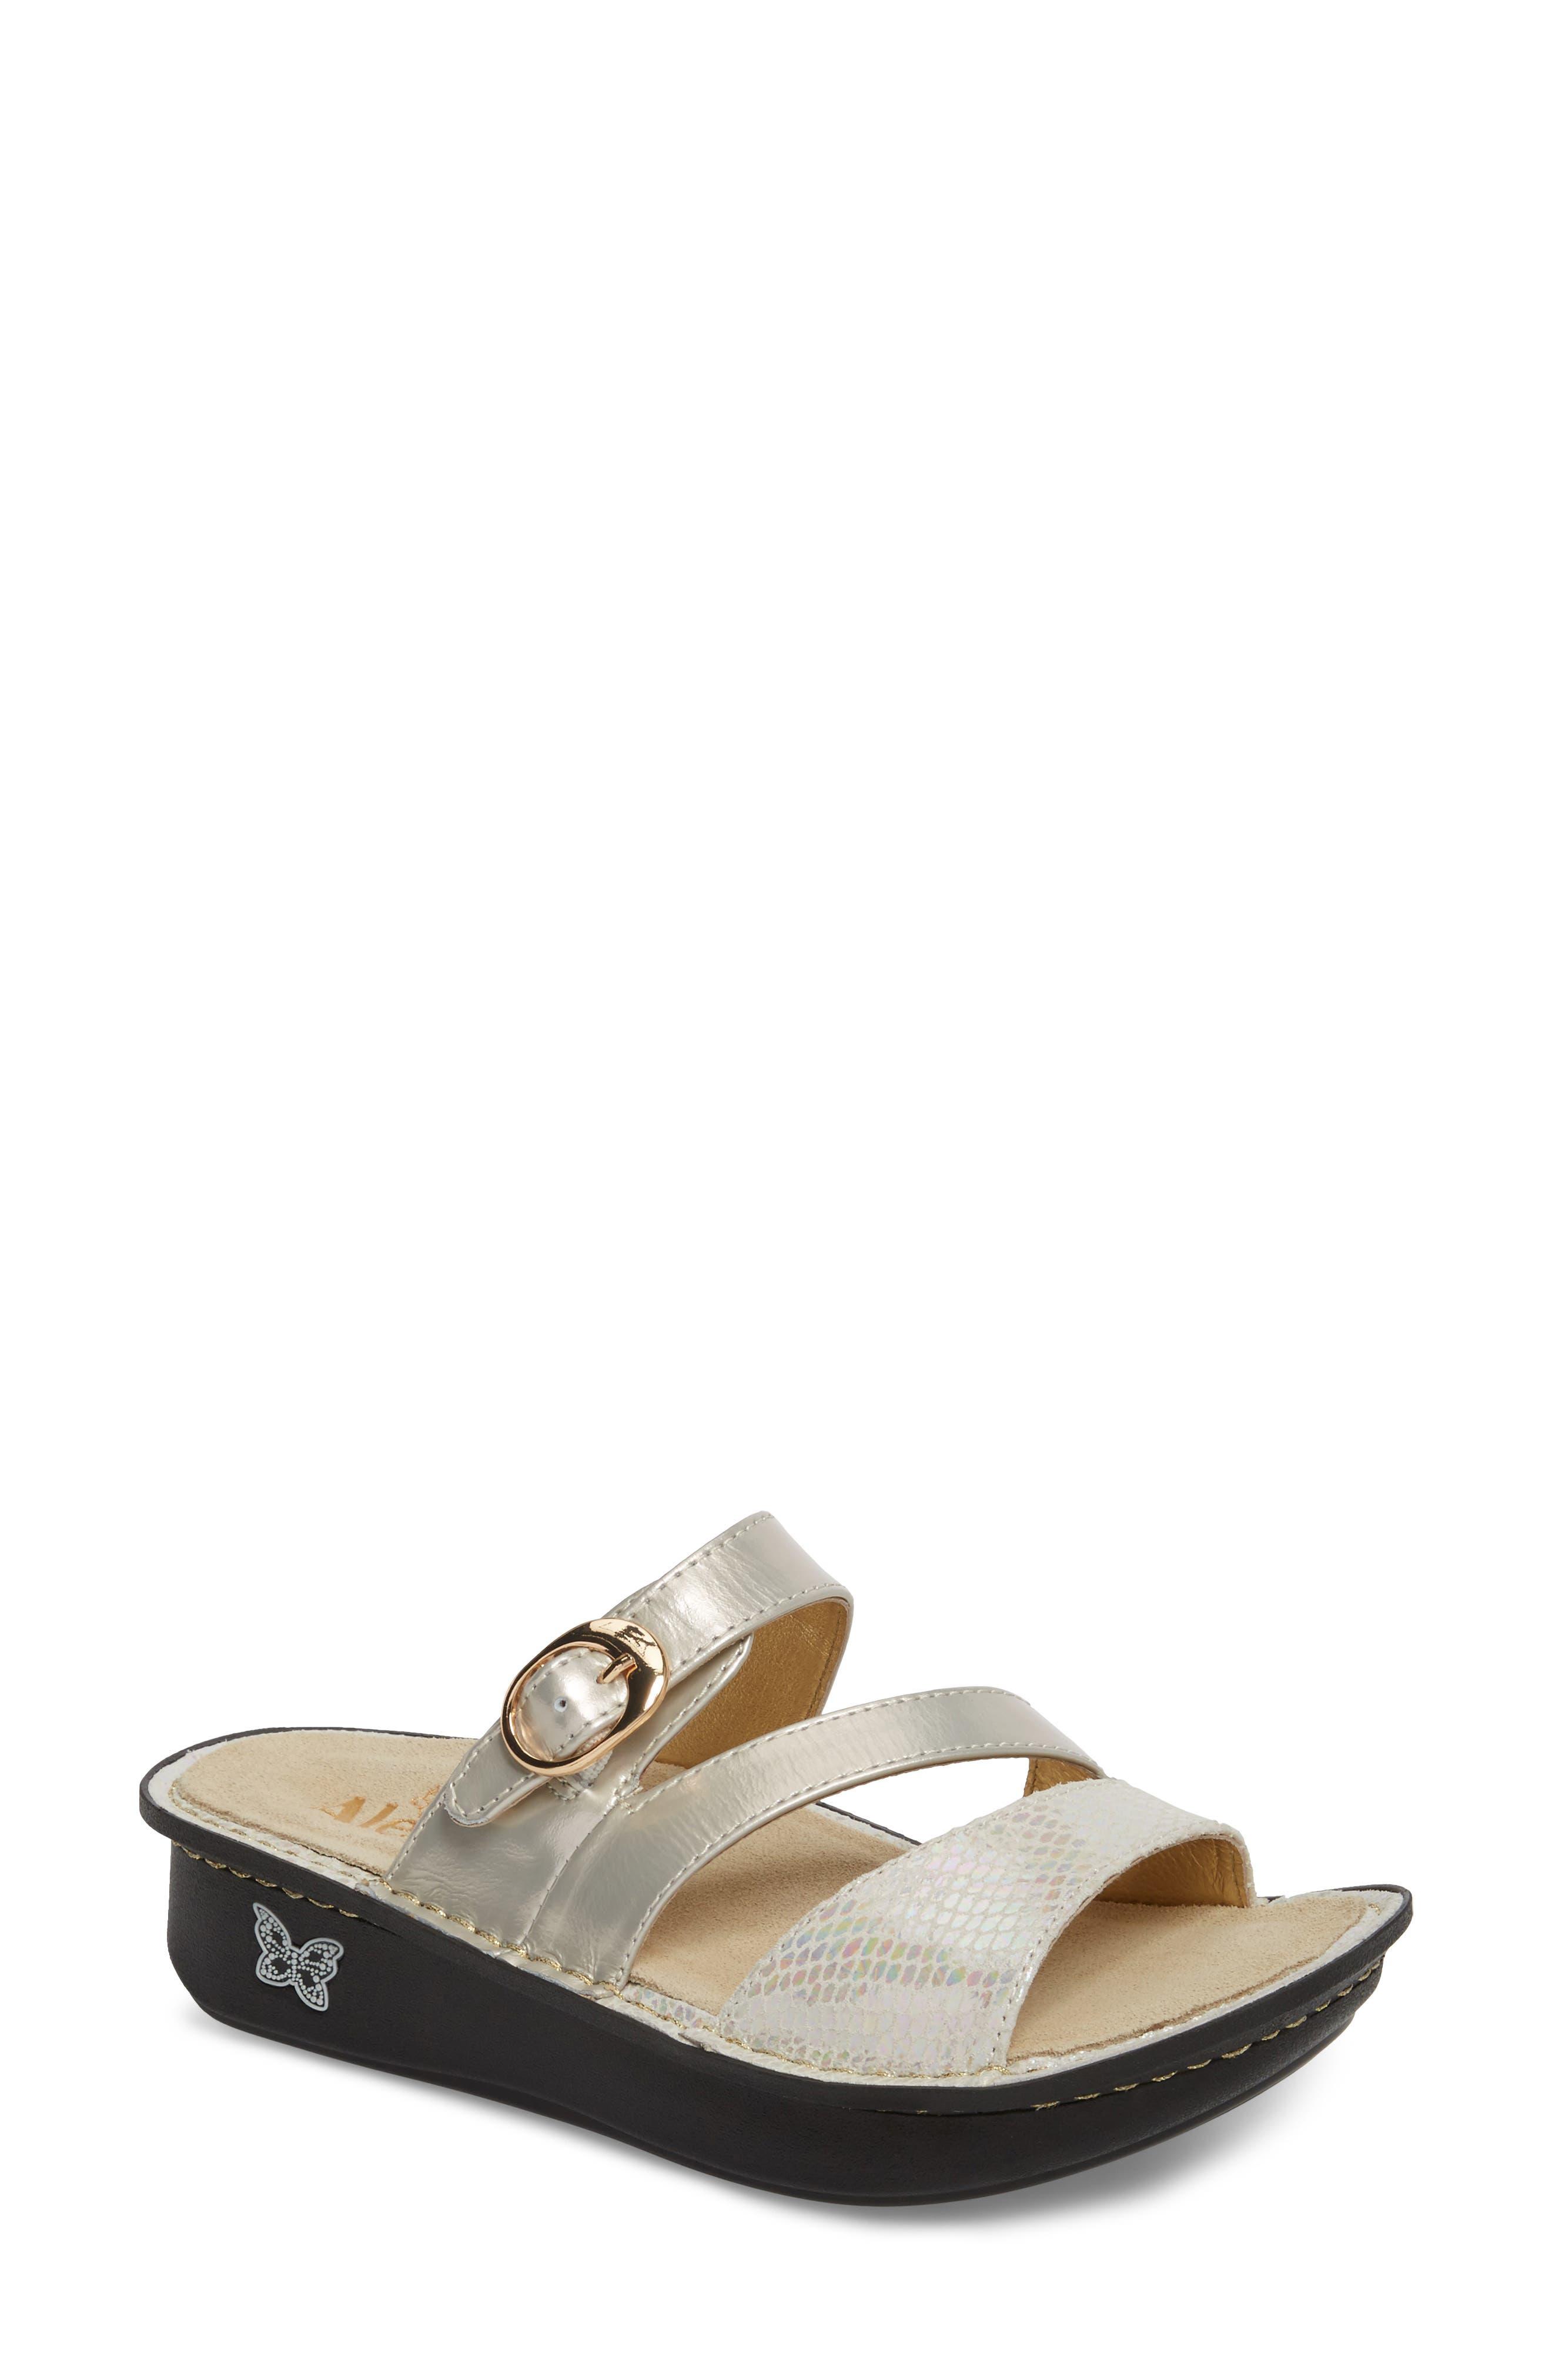 'Colette' Platform Sandal,                             Main thumbnail 1, color,                             Opfully Leather